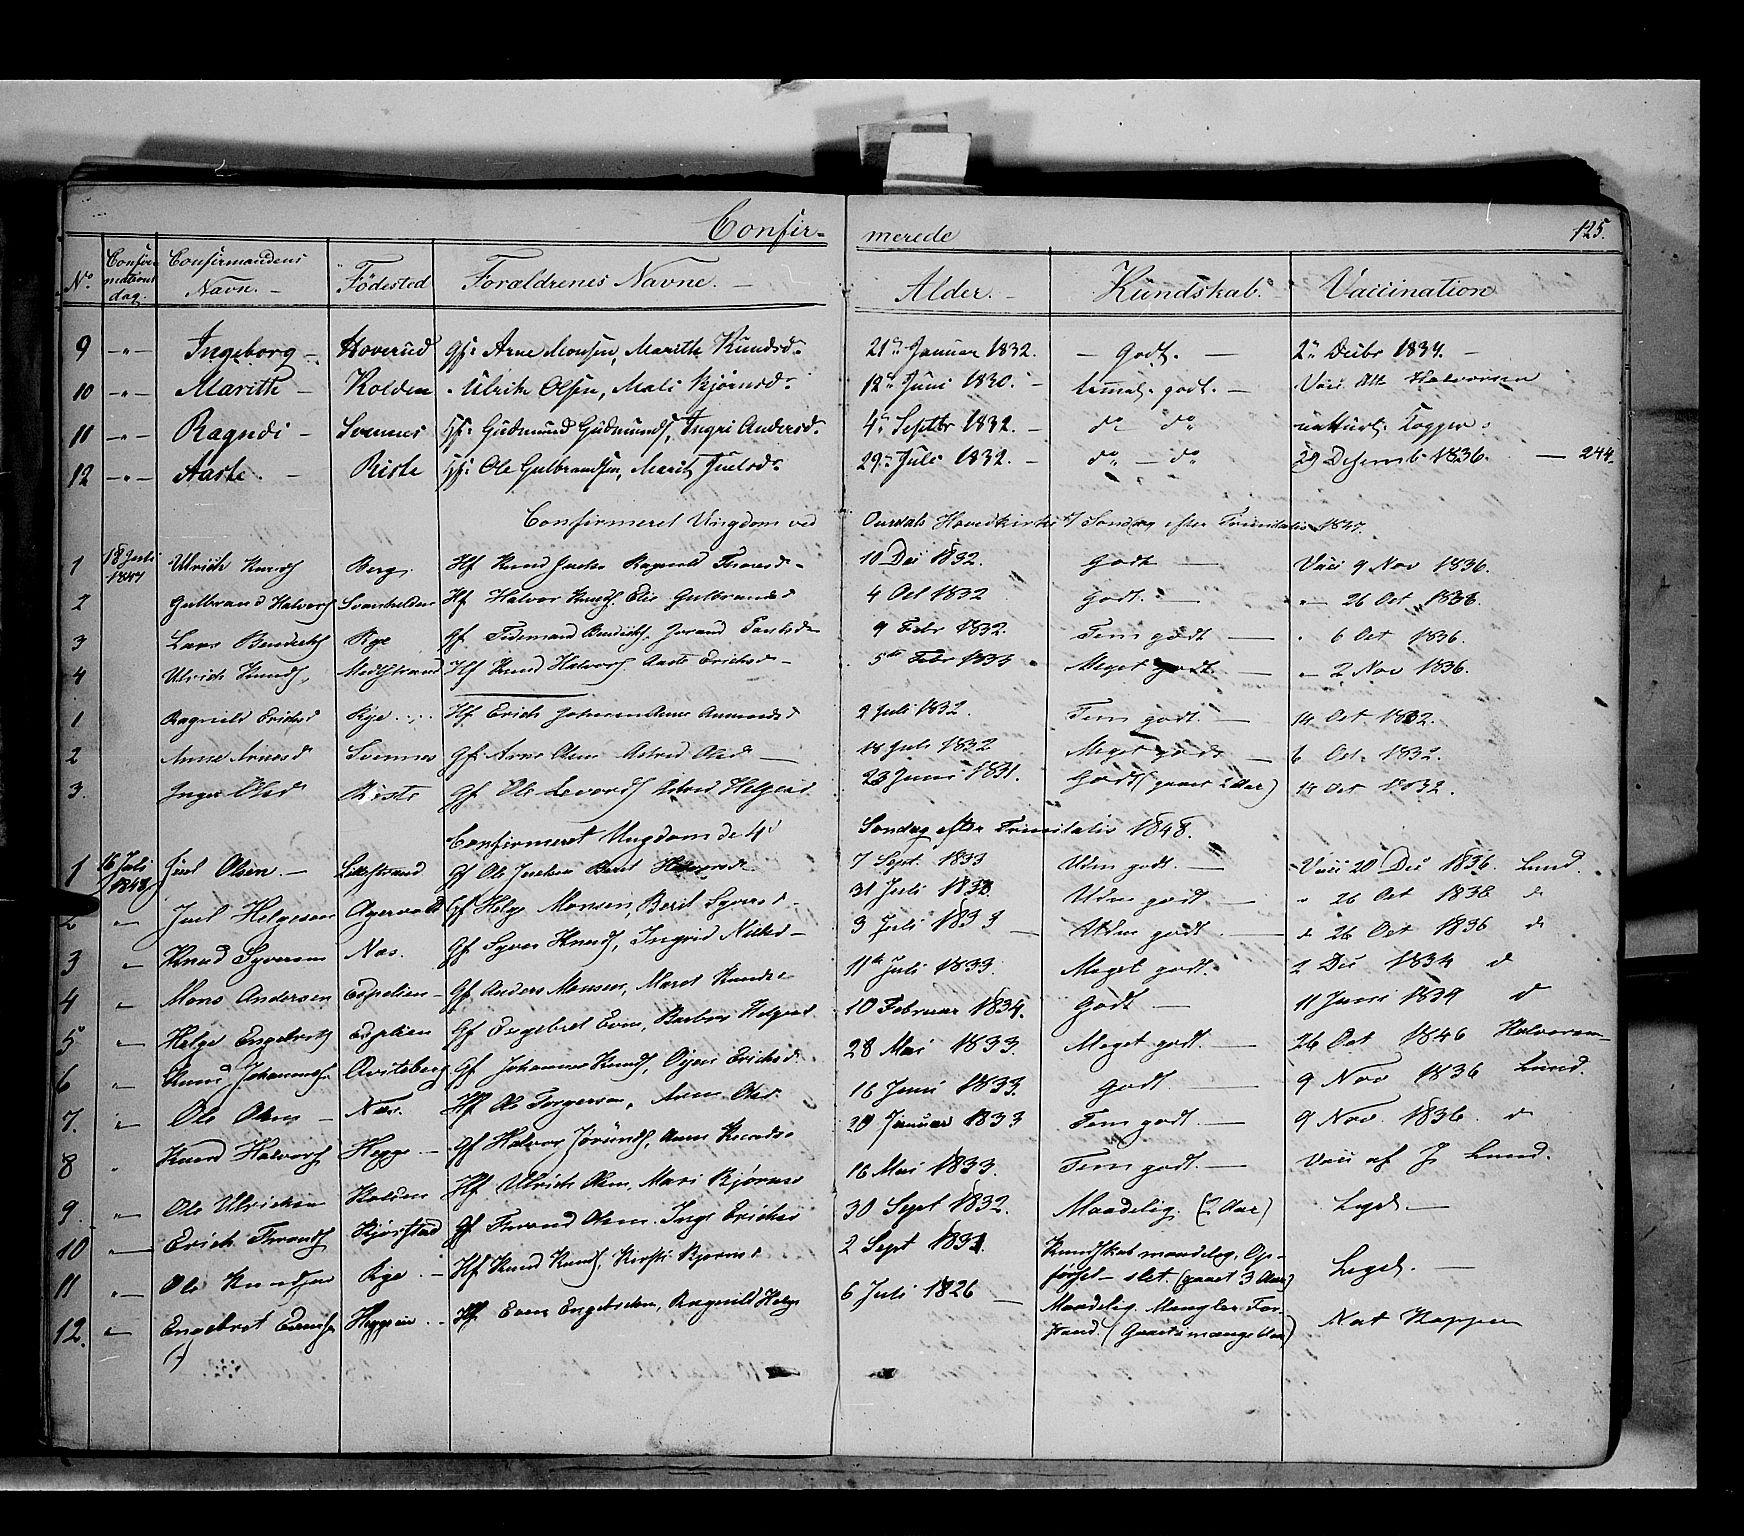 SAH, Nord-Aurdal prestekontor, Ministerialbok nr. 5, 1842-1863, s. 125